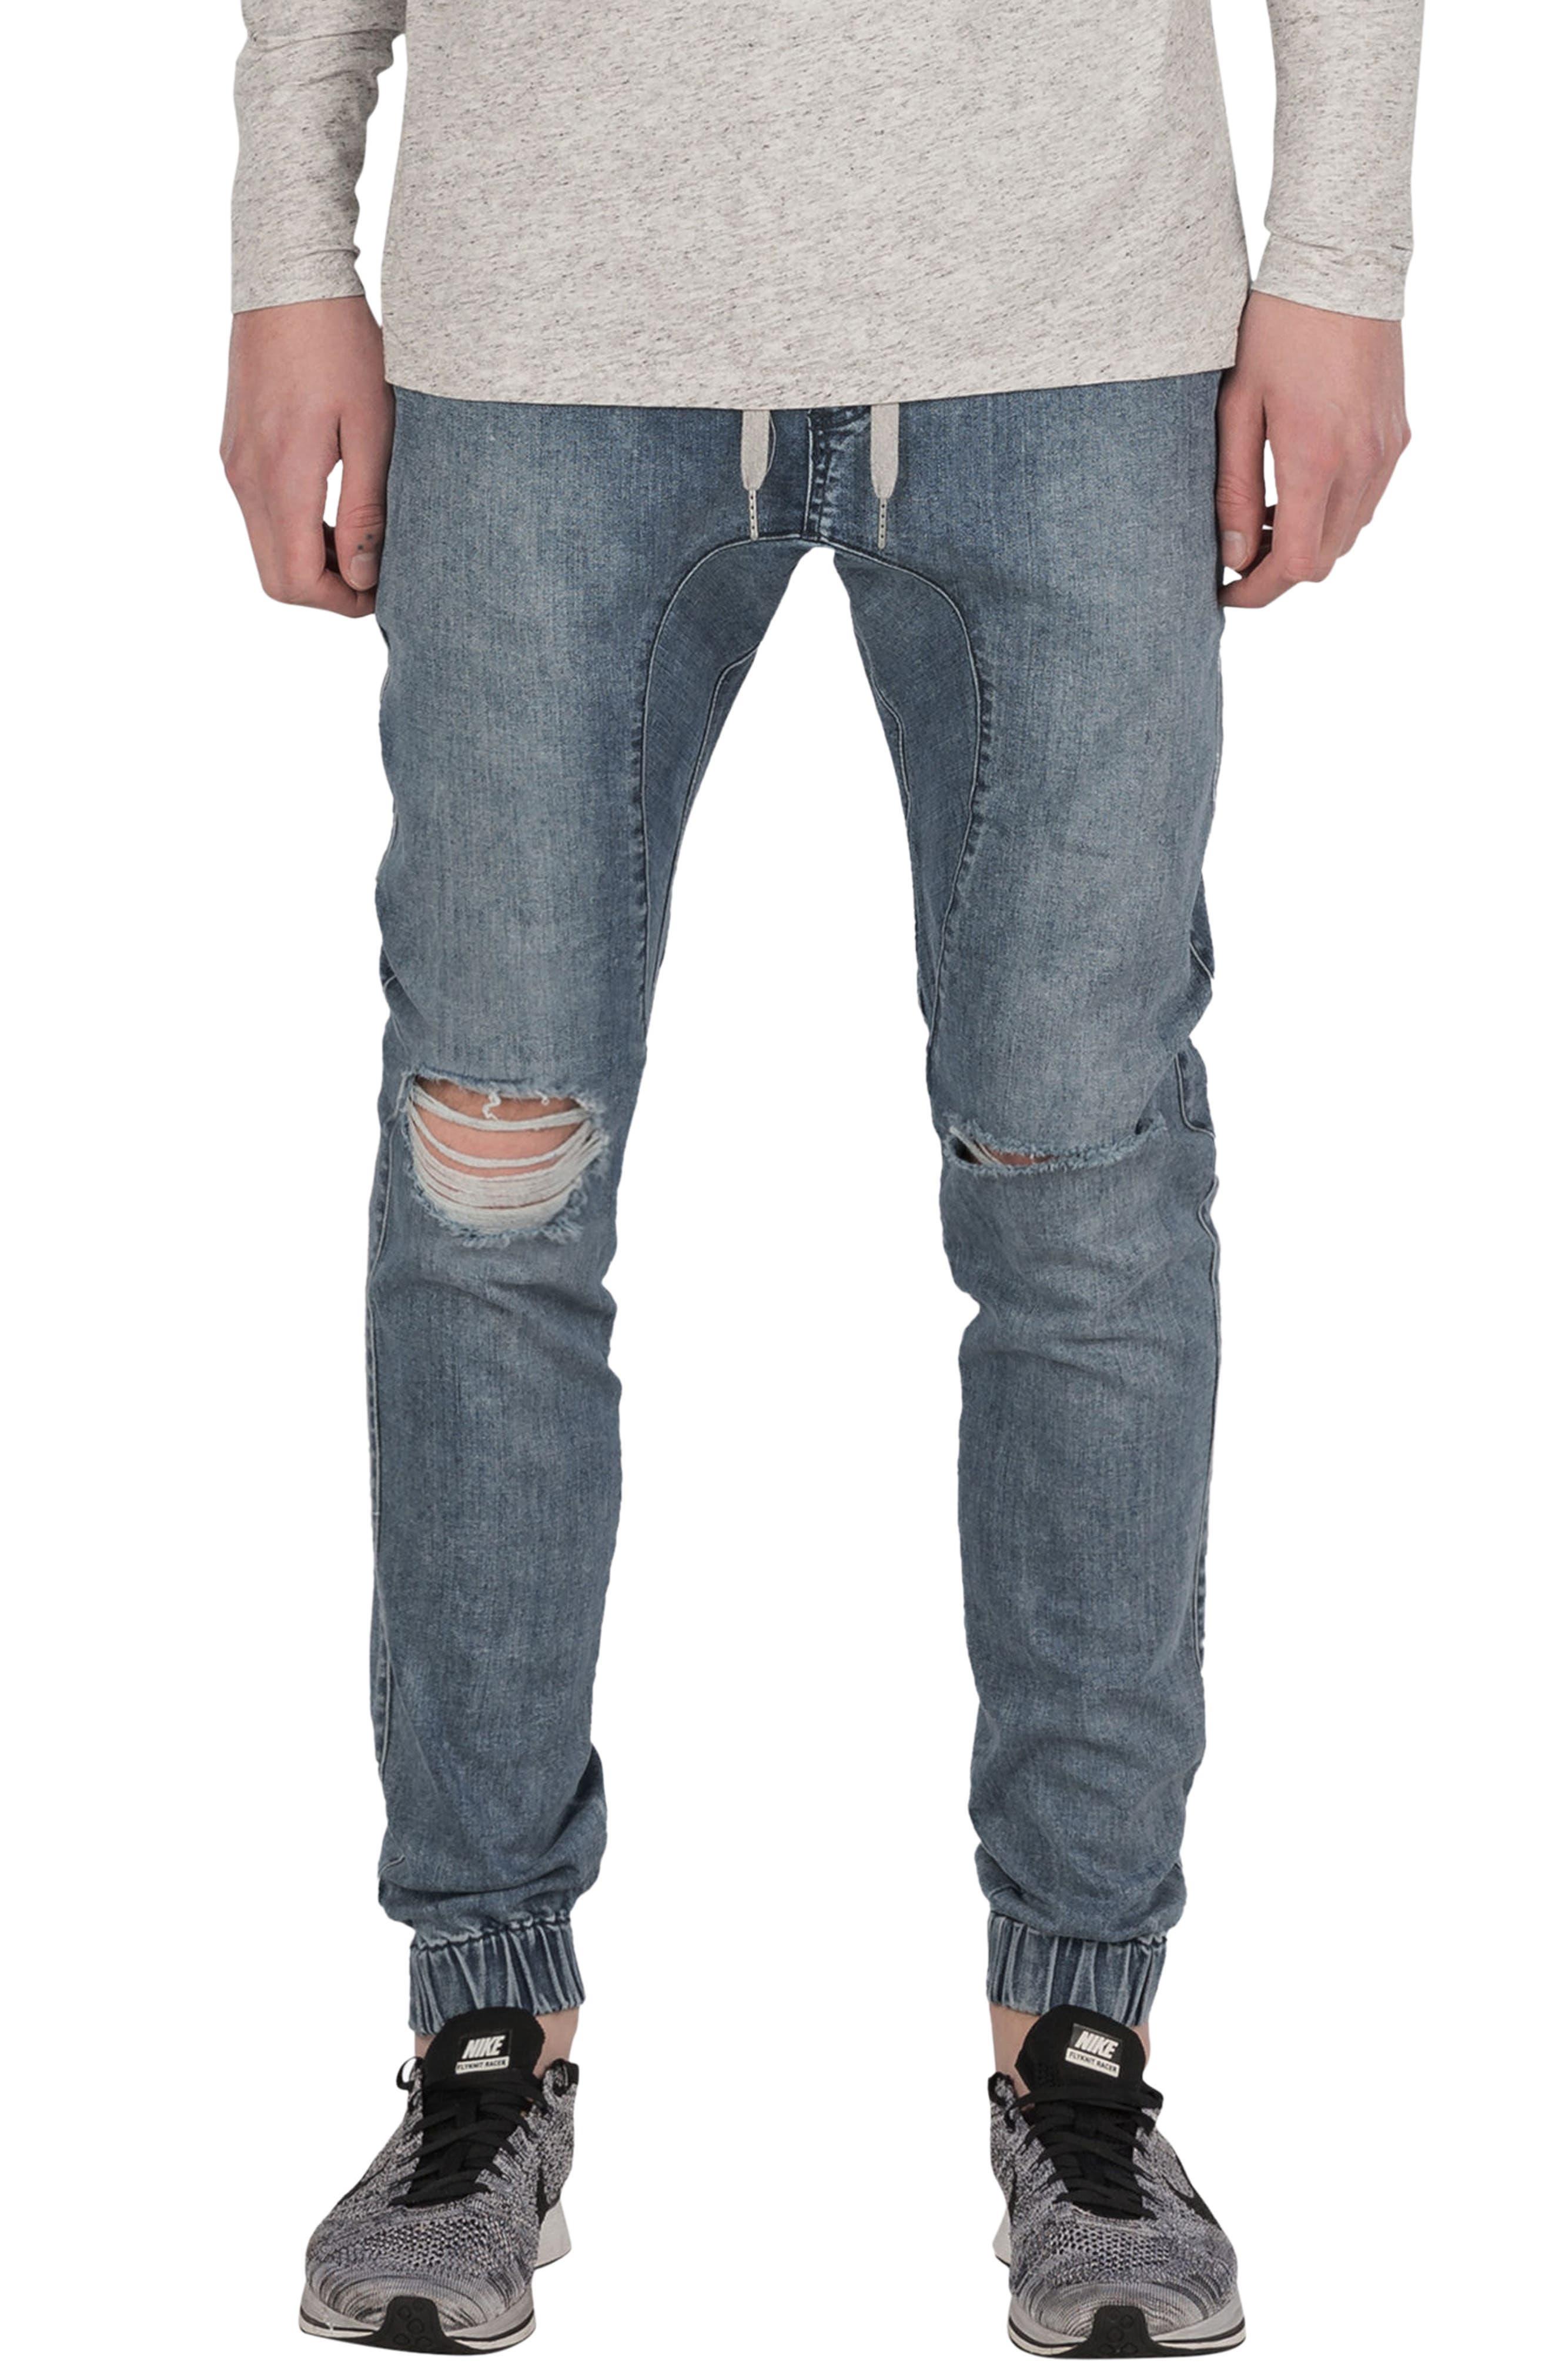 ZANEROBE Sureshot Decon Slim Fit Jogger Pants